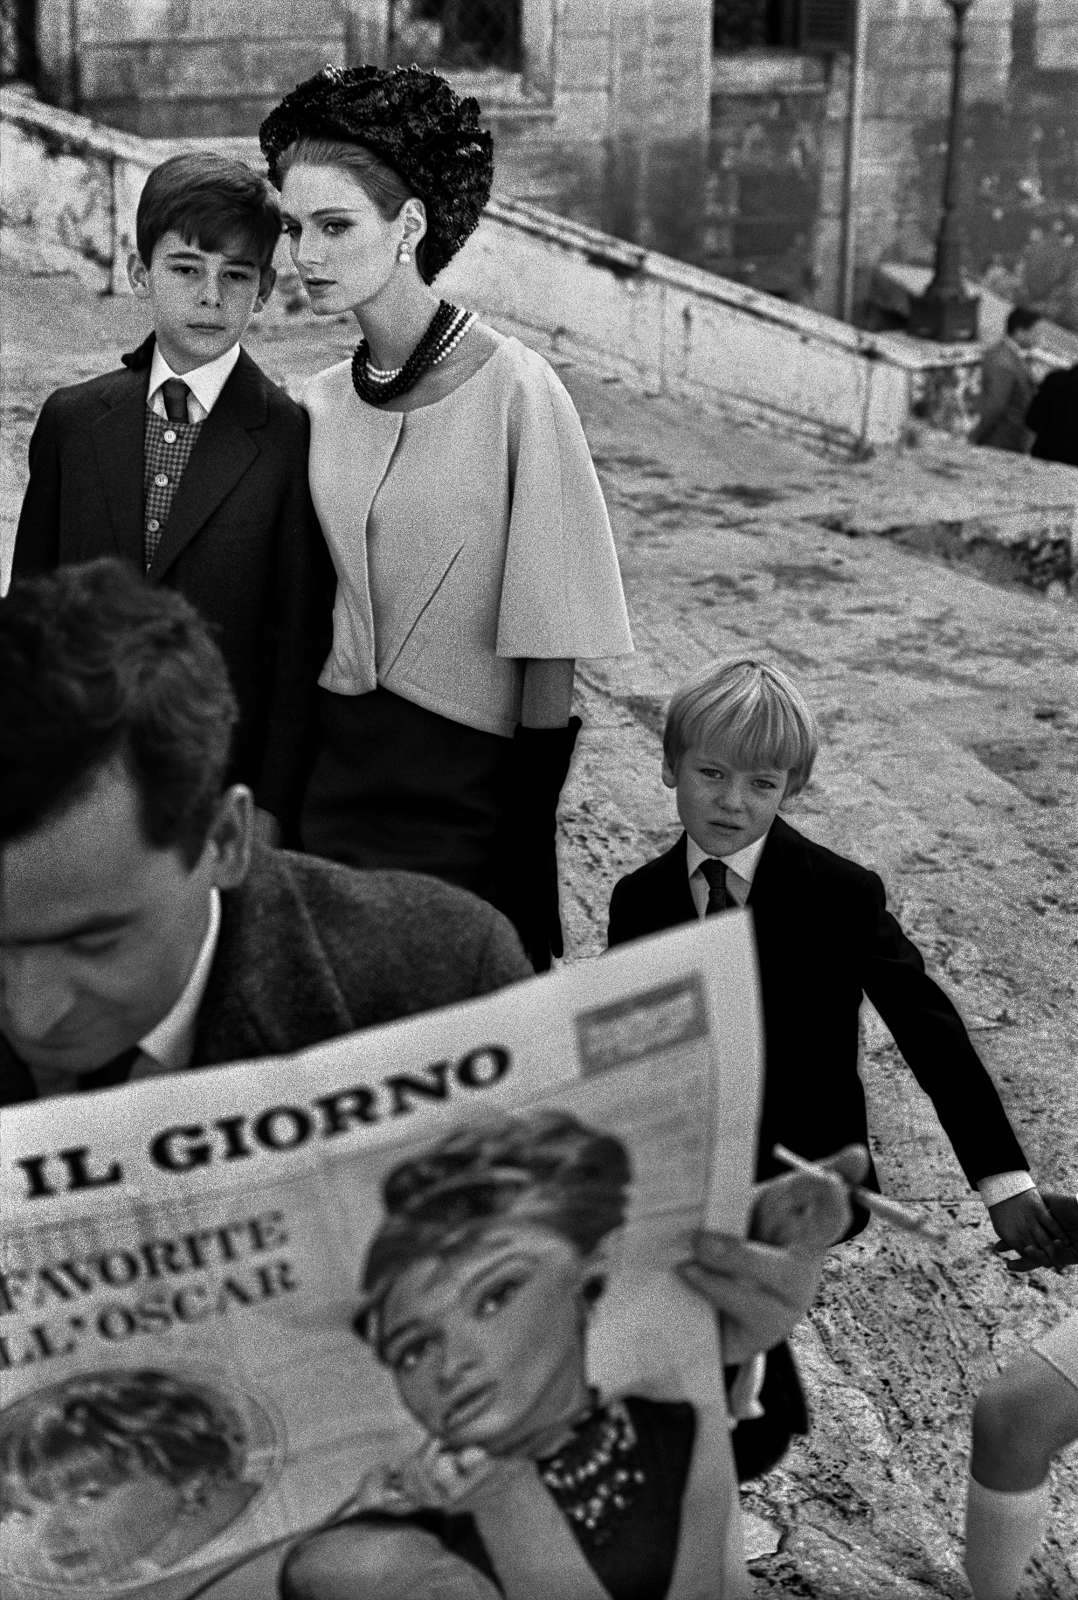 Roma, Italy for Harper's Bazaar, 1962